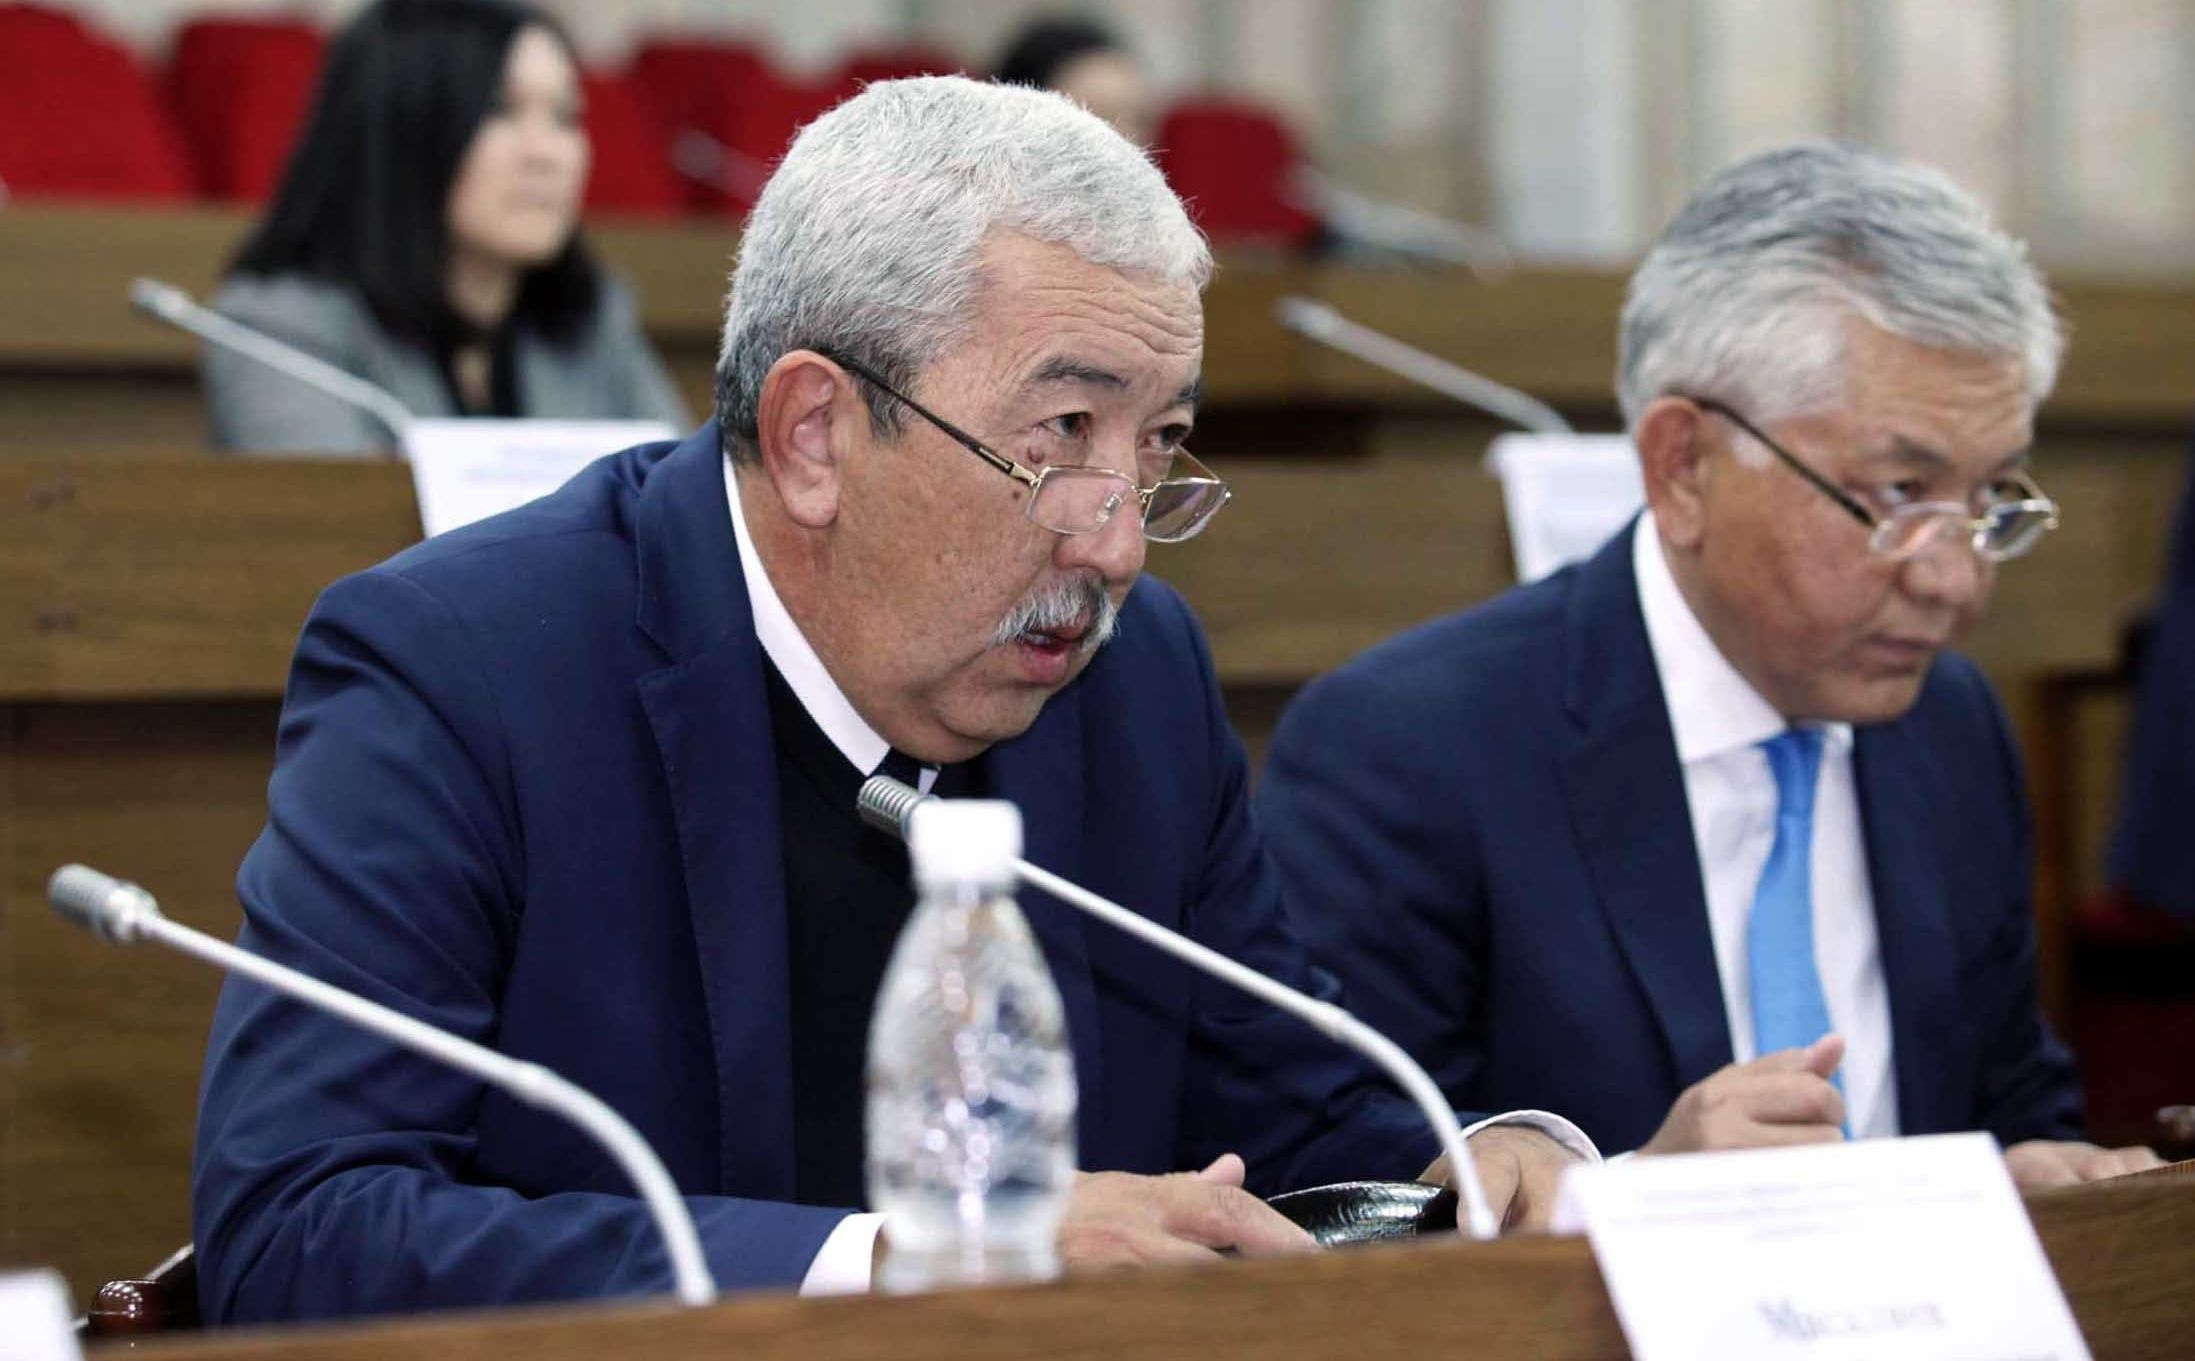 Депутат ЖК VI созыва Исхак Масалиев от партии Кыргызстан на заседании